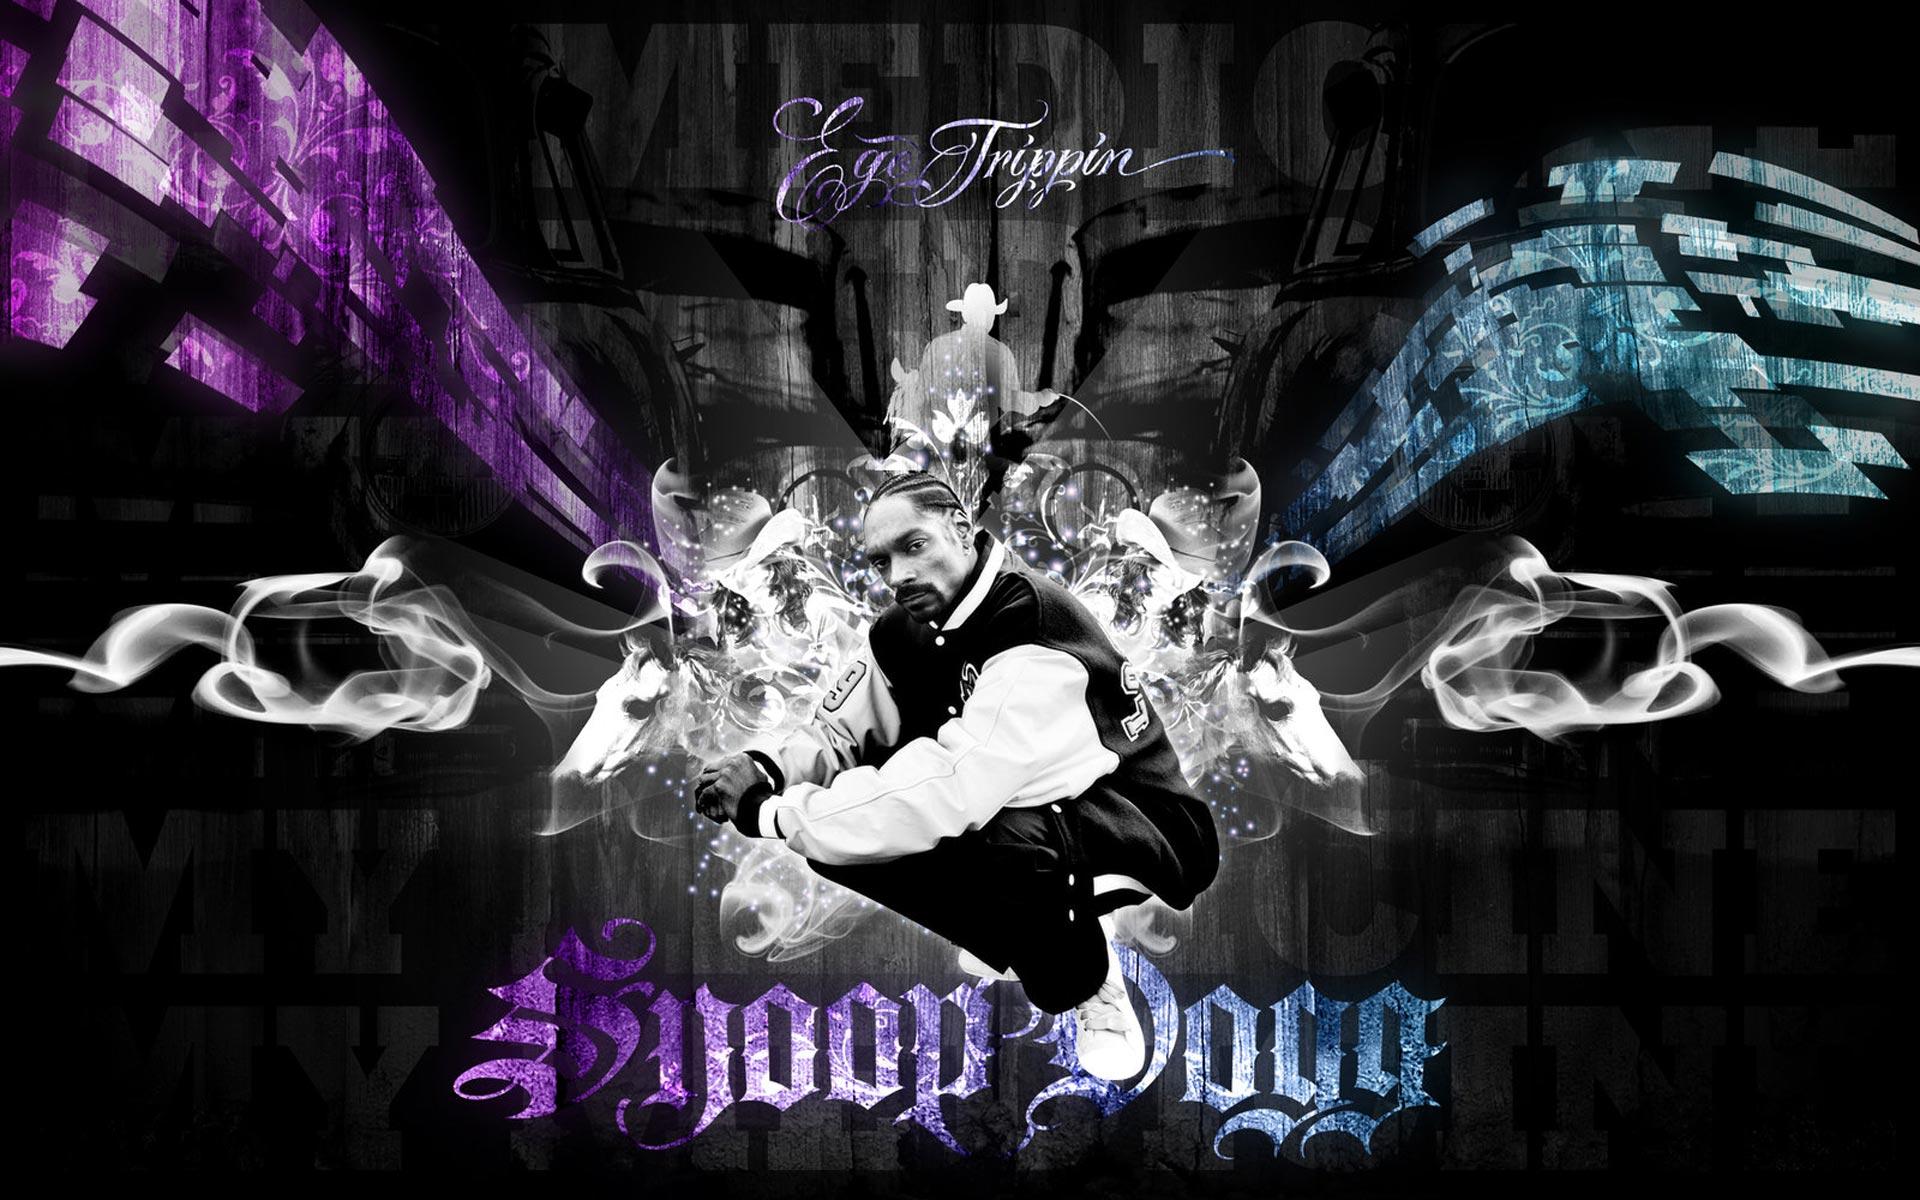 Snoop Dogg Gangsta Hip Hop Rap Wallpaper   hip hop desktop wallpaper 1920x1200